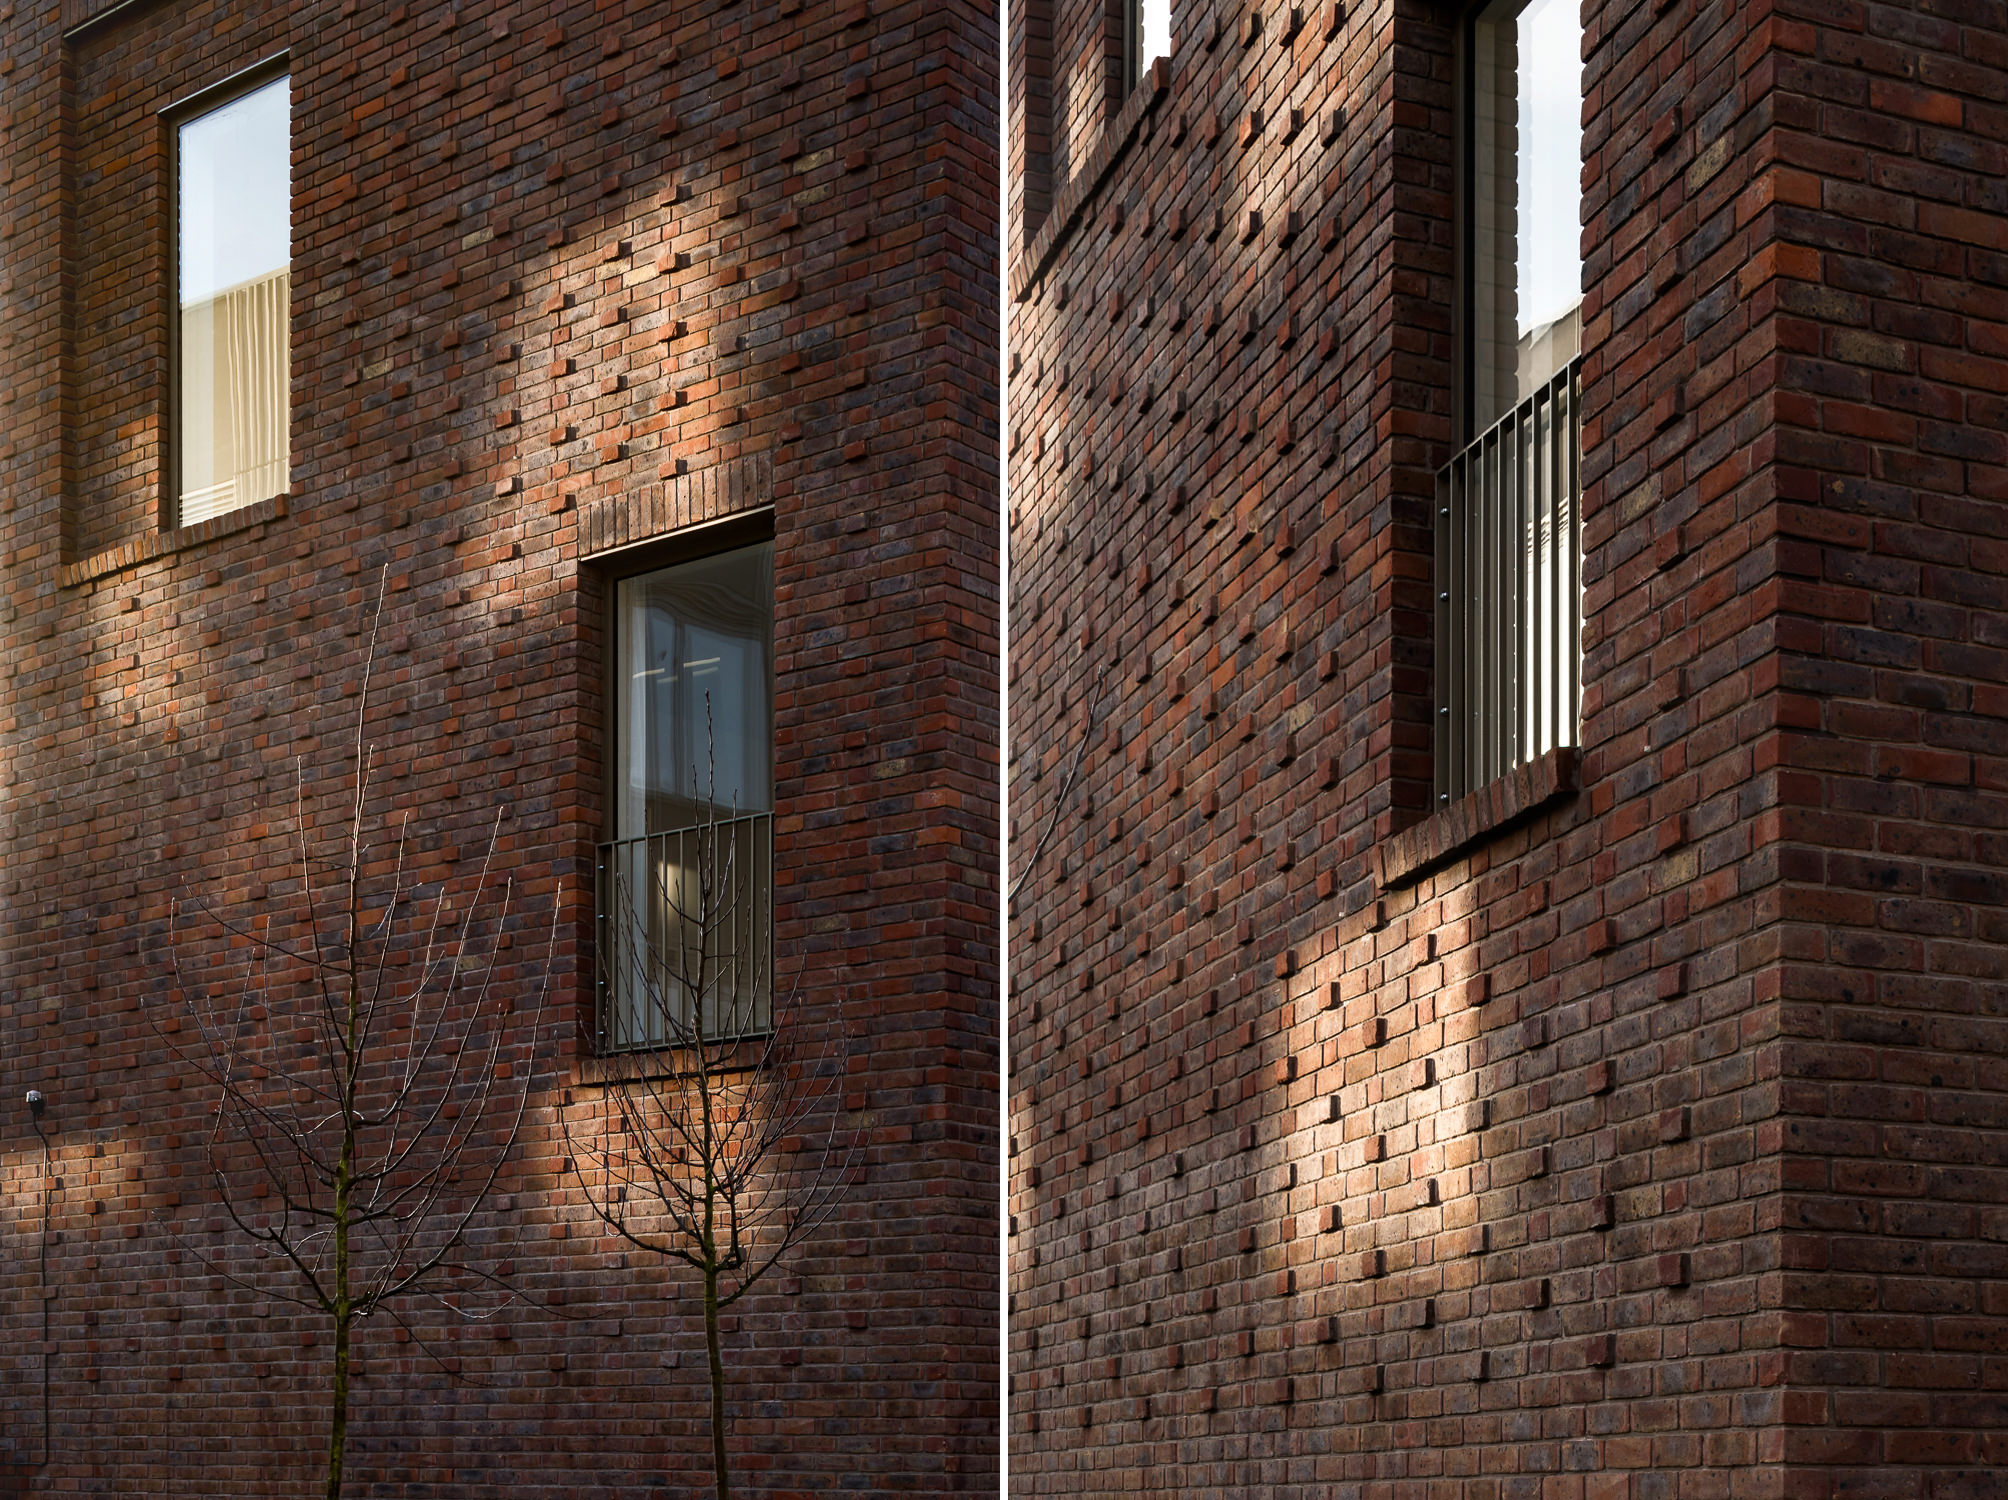 mark-hadden-architecture-photographer-architectuur-interieur-fotografie-london-amsterdam-Dujardin Mews-072 copy.jpg